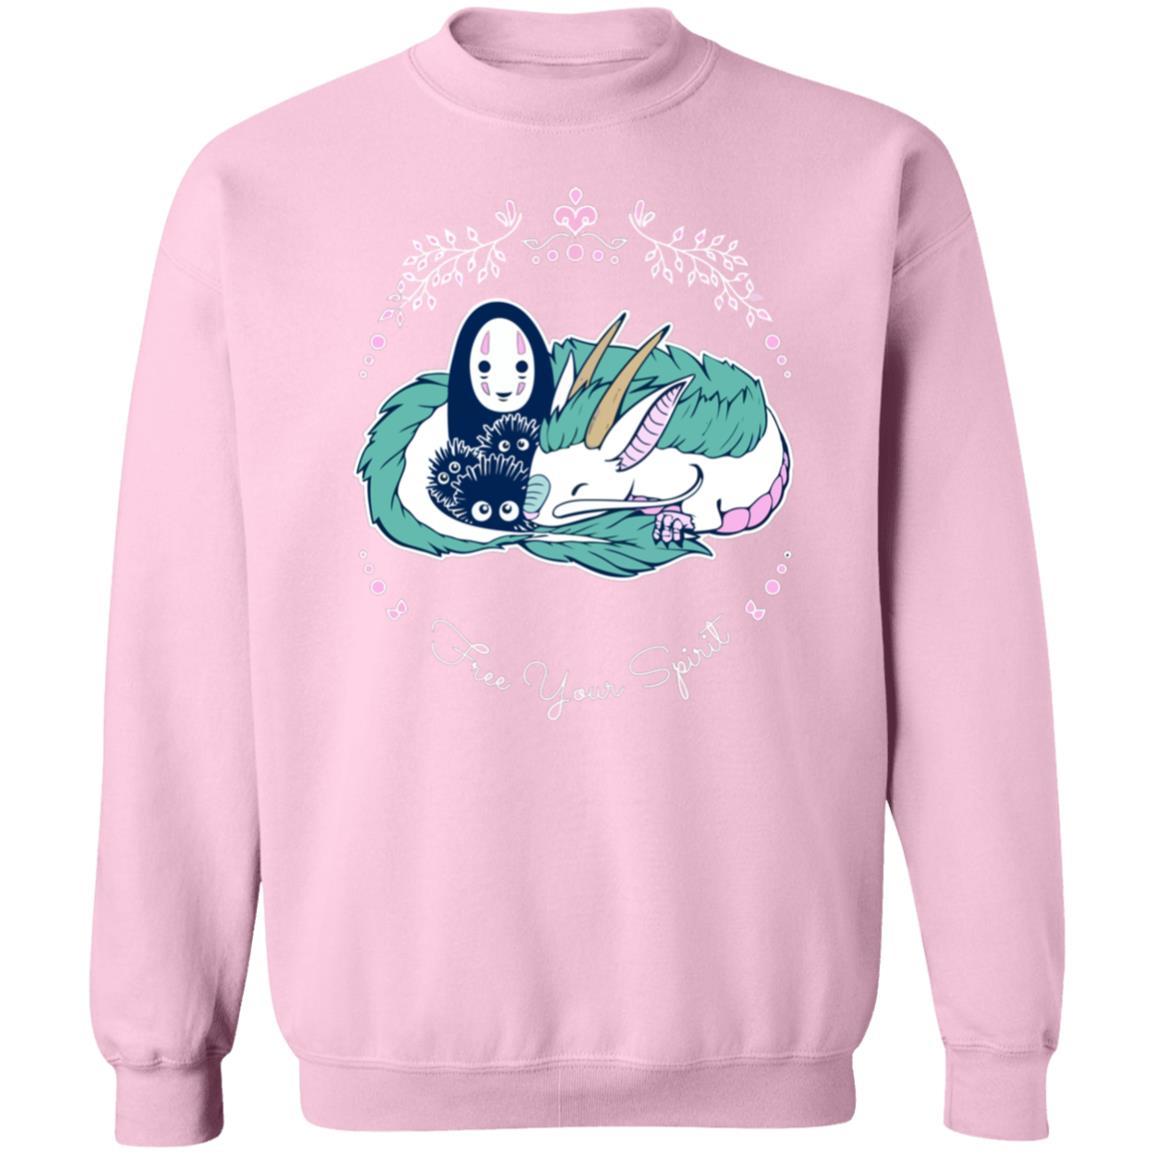 Spirited Away – No Face and Haku Dragon Sweatshirt